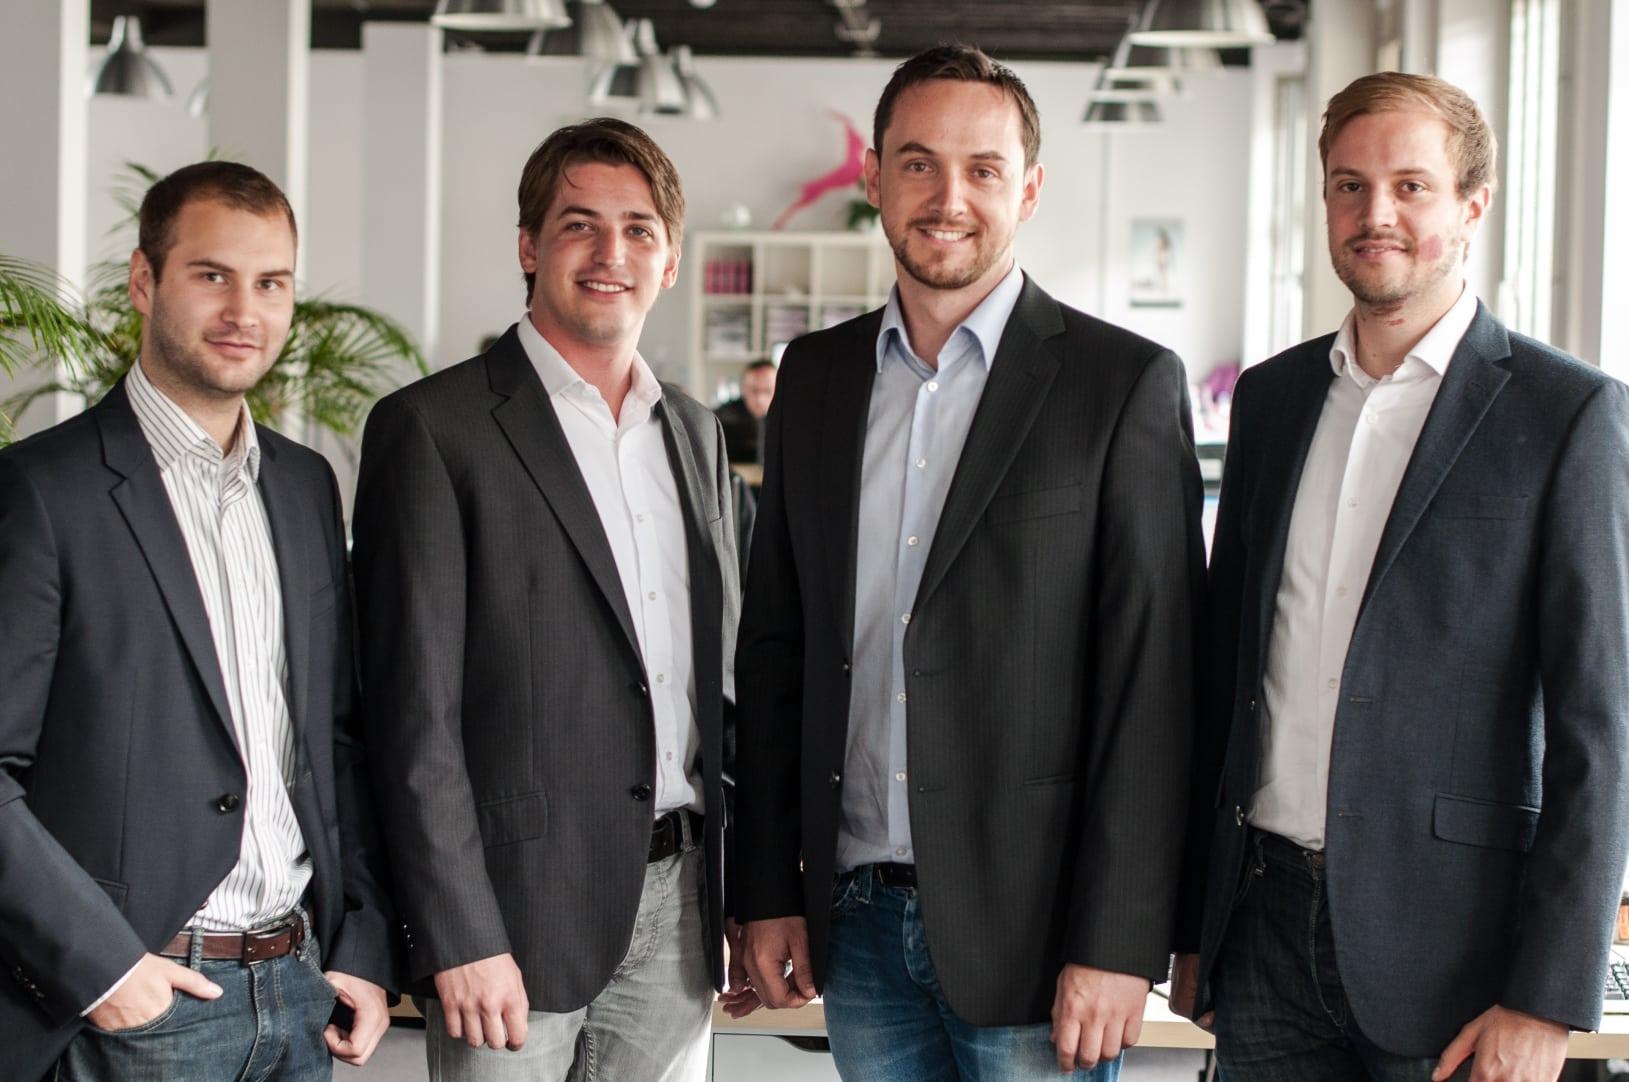 Les fondateurs de Signavio – en partant de la gauche: Torben Schreiter, Nicolas Peters, Willi Tscheschner et Gero Decker